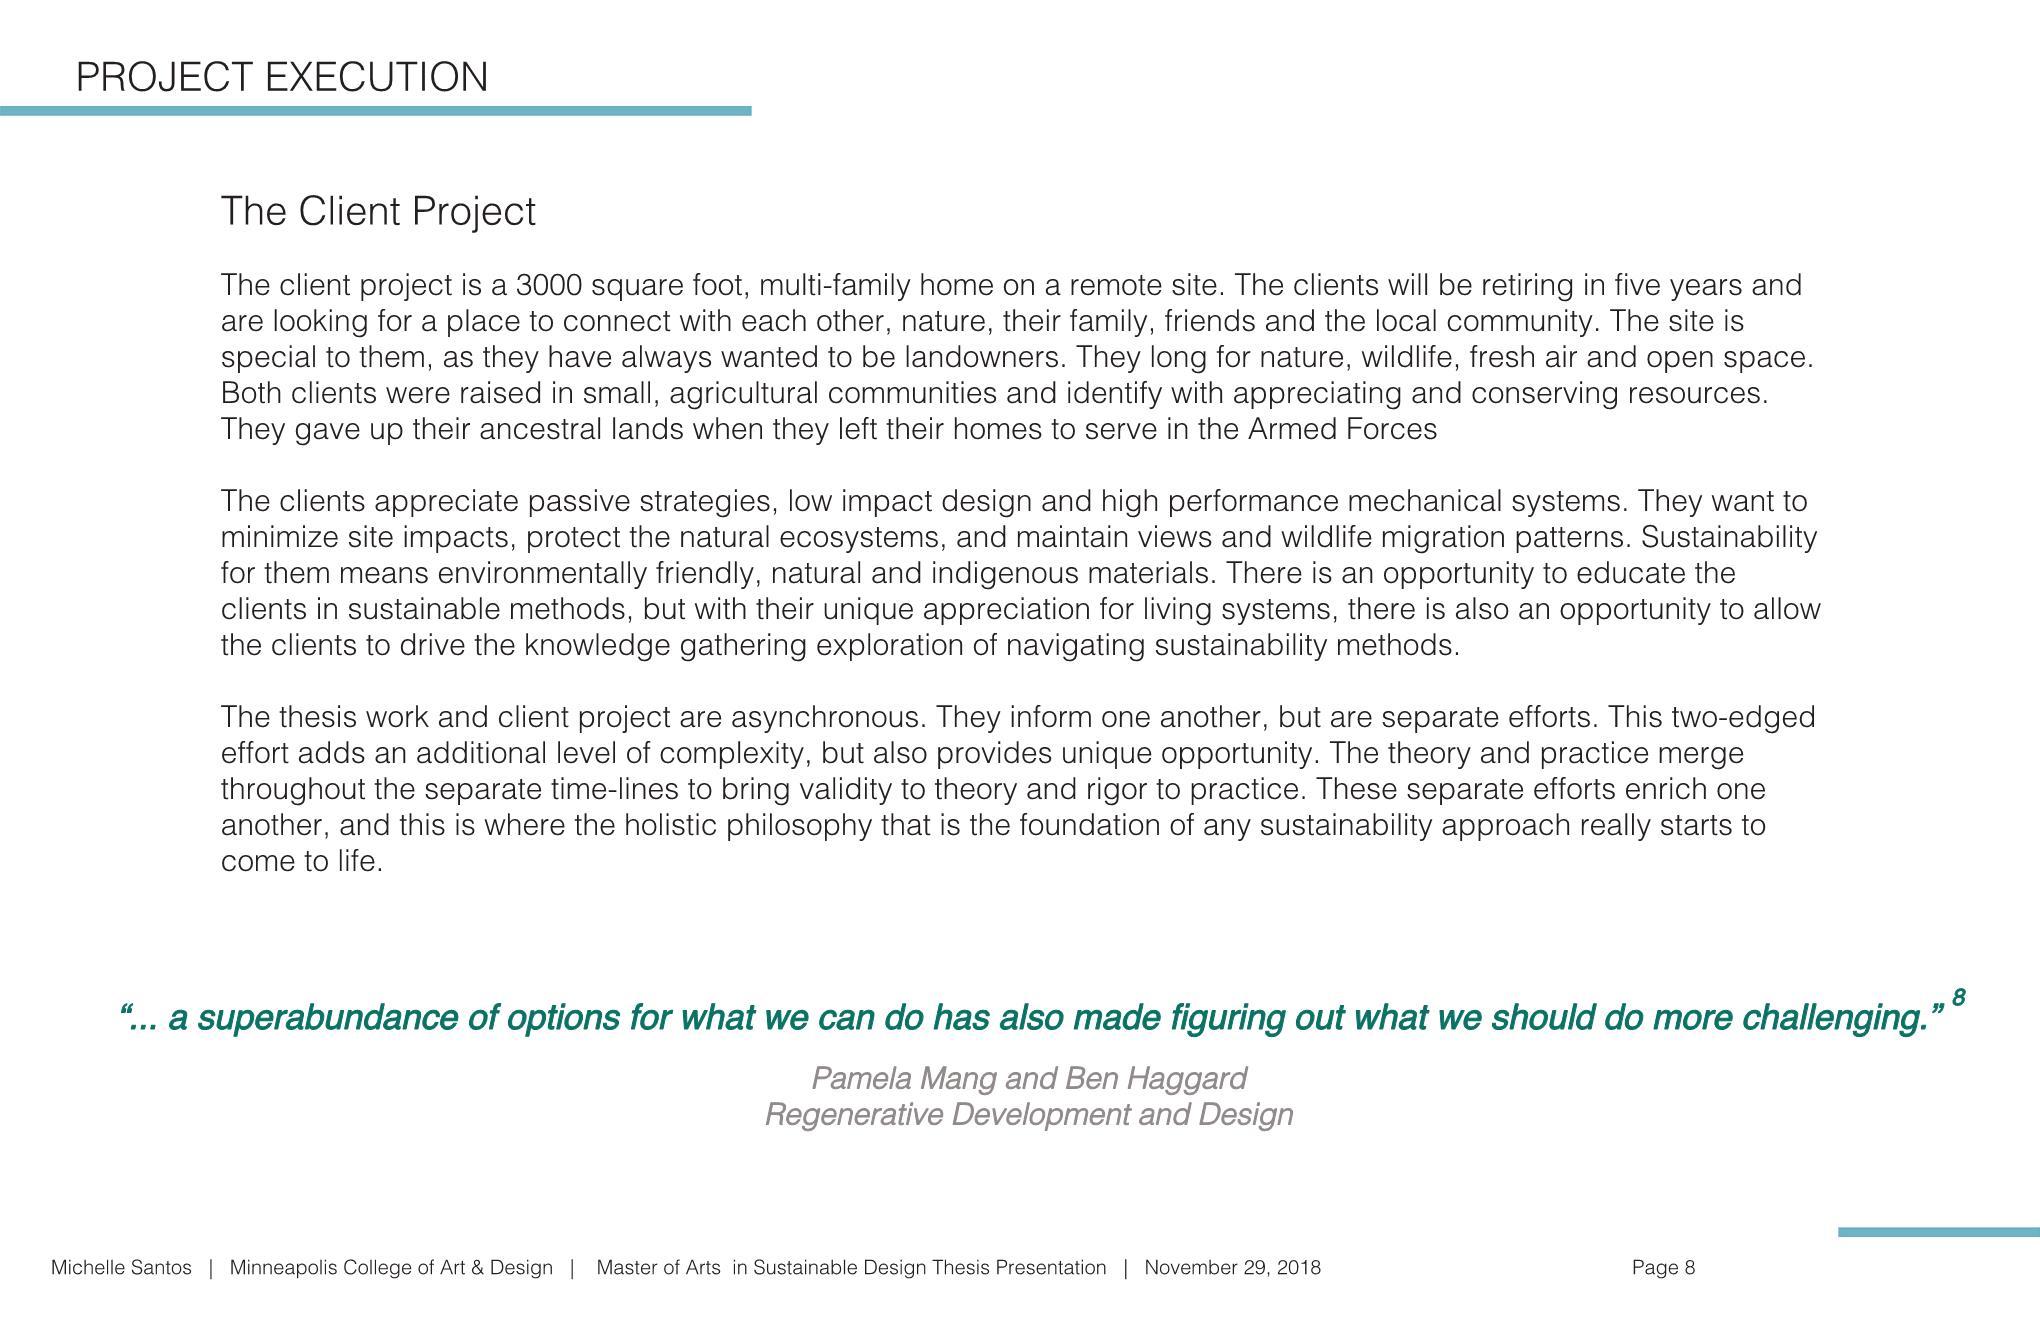 MSantos_Thesis Presentation_2018.12.11_small2 Page 010.jpg